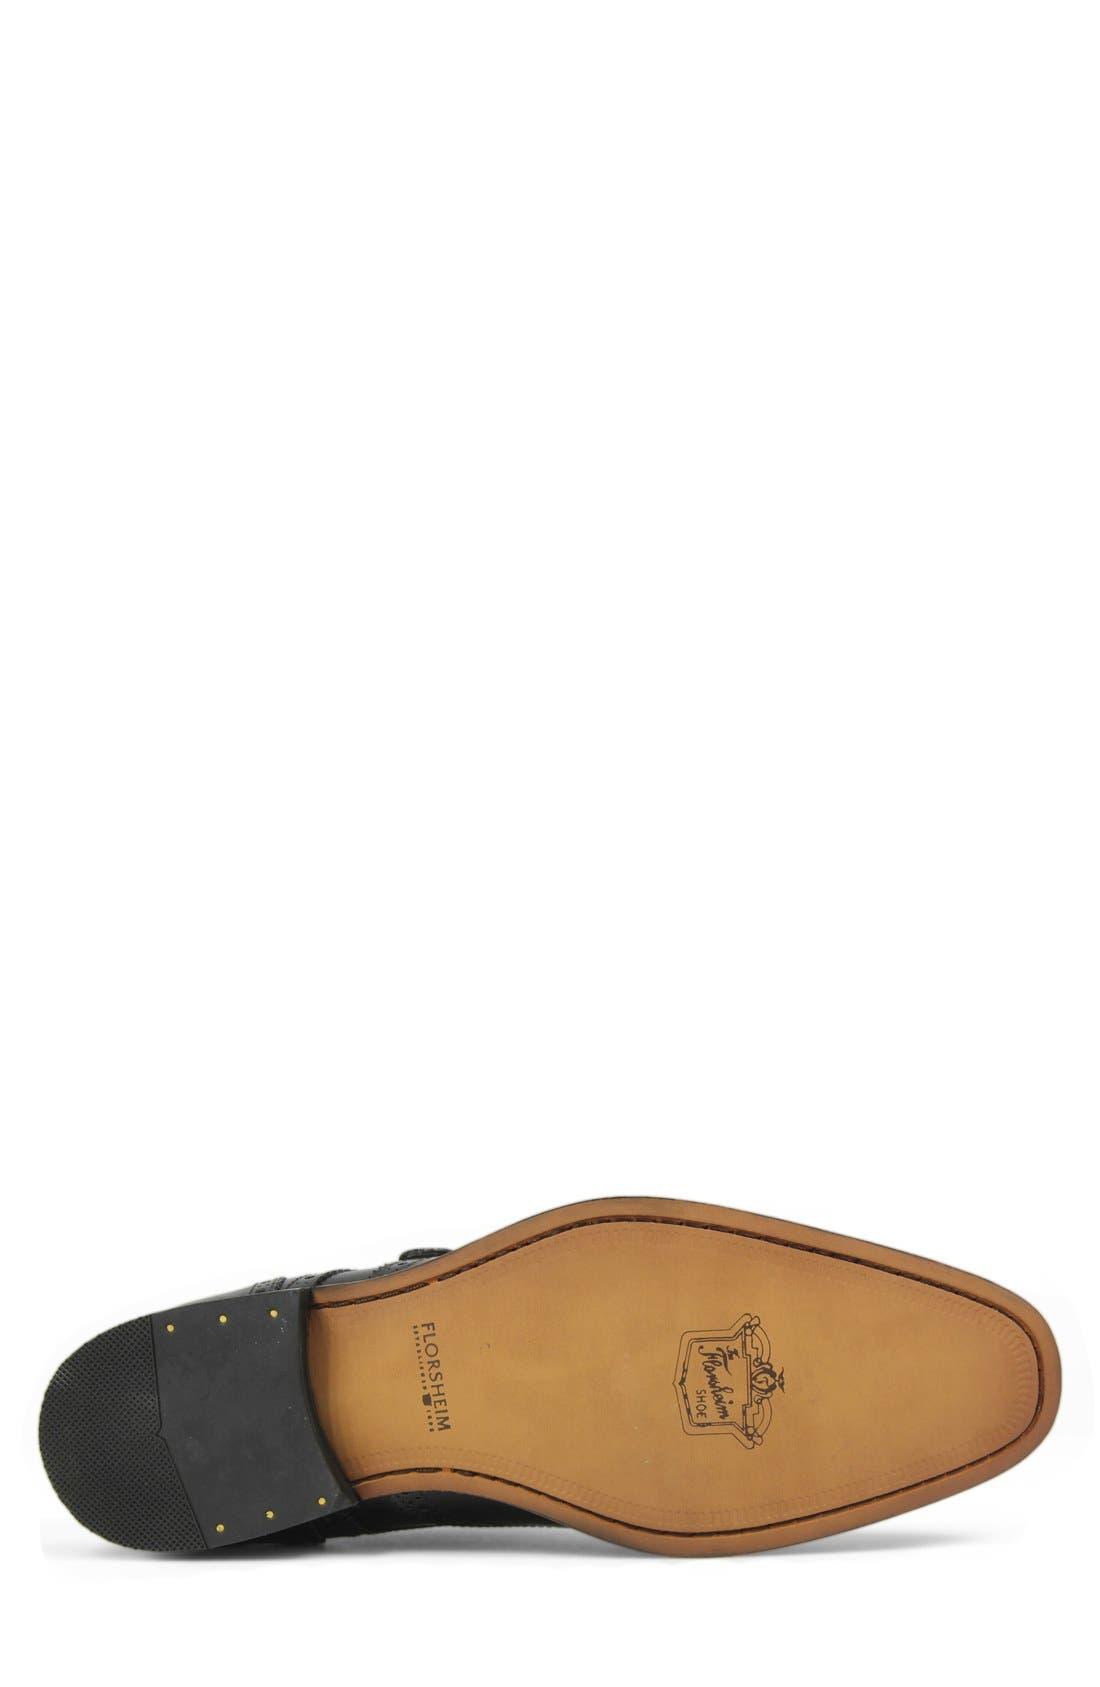 'Sabato' Wingtip Monk Strap Shoe,                             Alternate thumbnail 4, color,                             Black